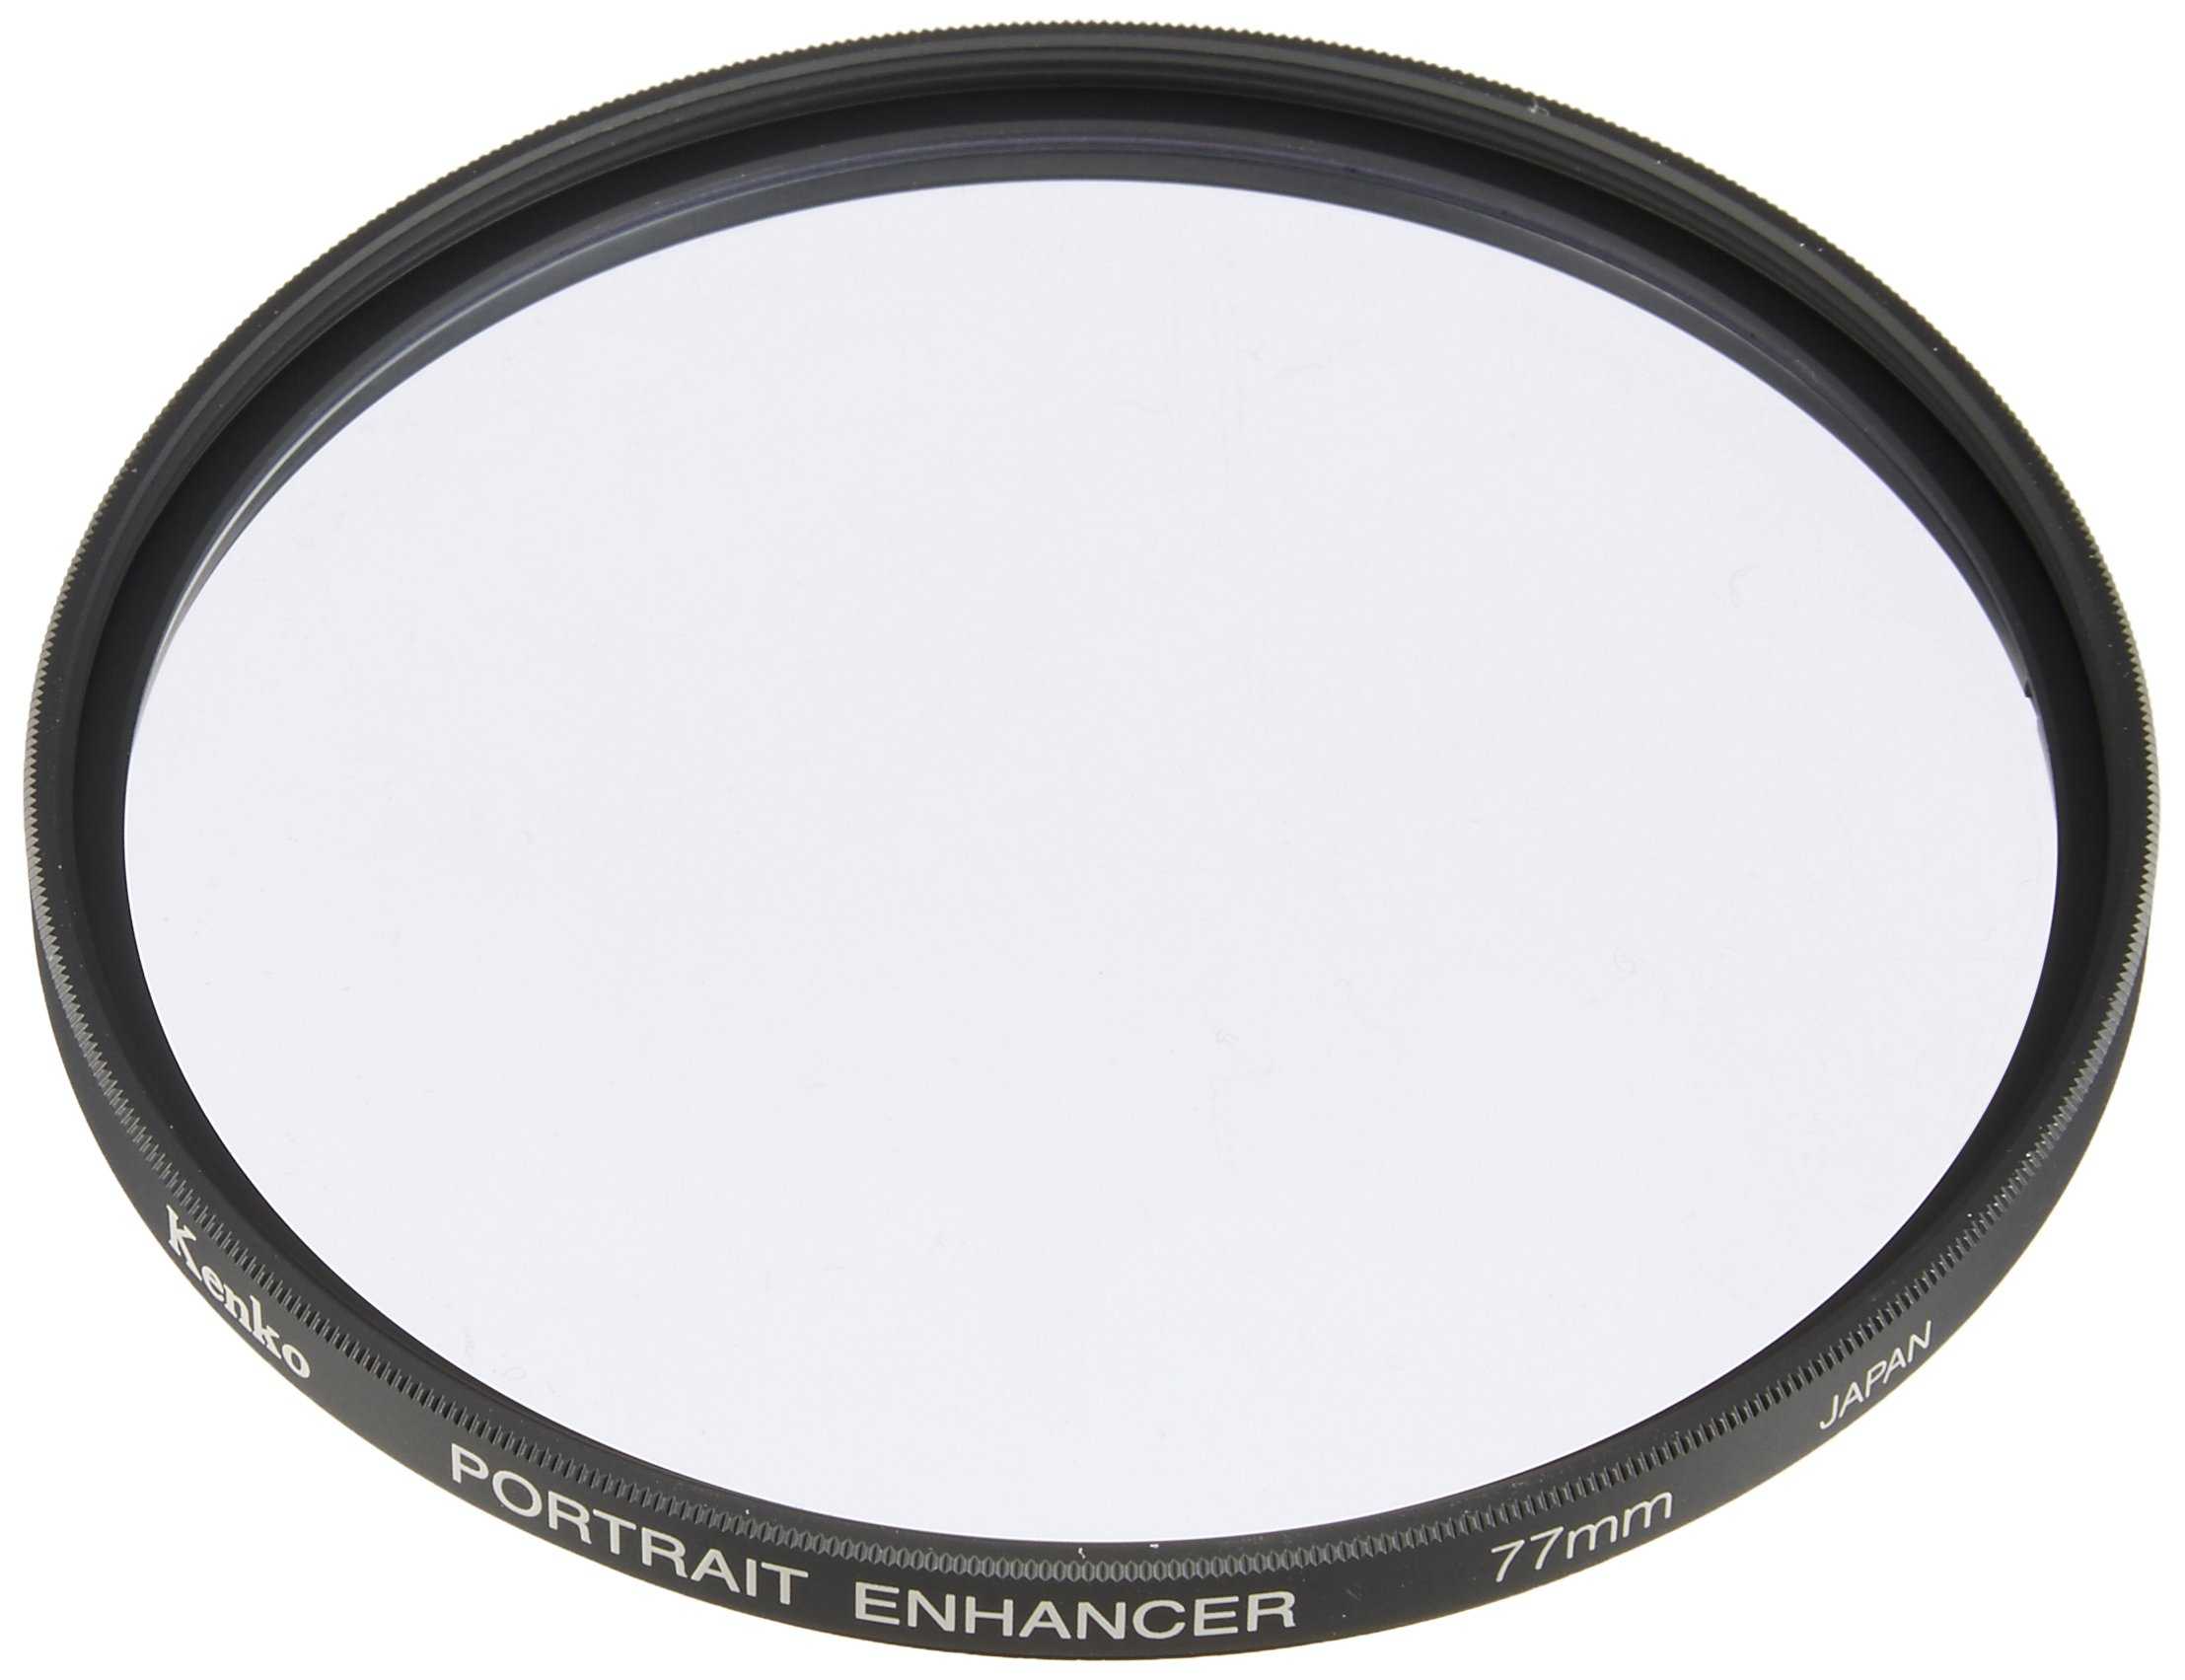 Kenko 77mm Portrait Enhancer Camera Lens Filters